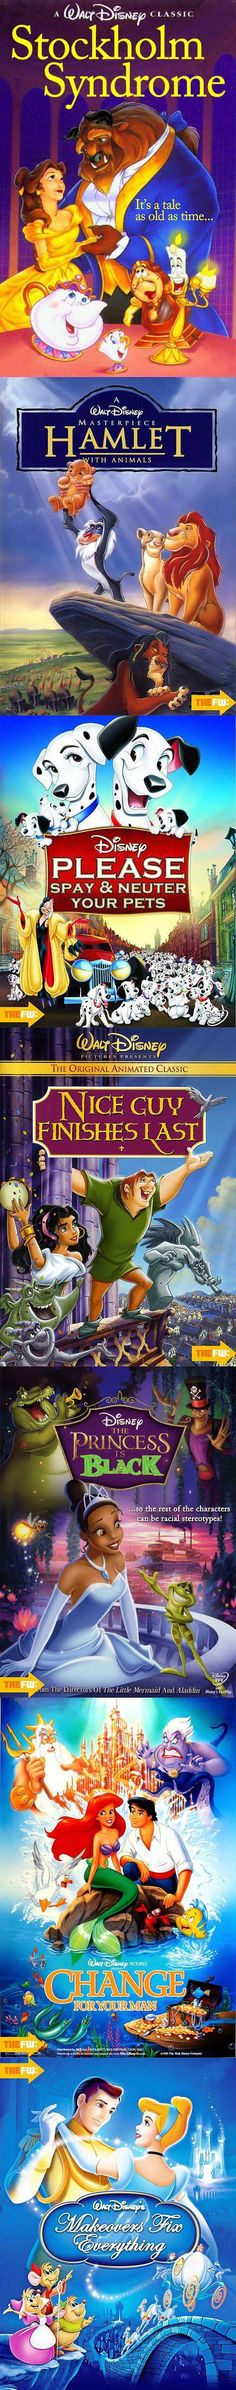 Alternate Disney film titles.  Spot on.  SOO FUNNY